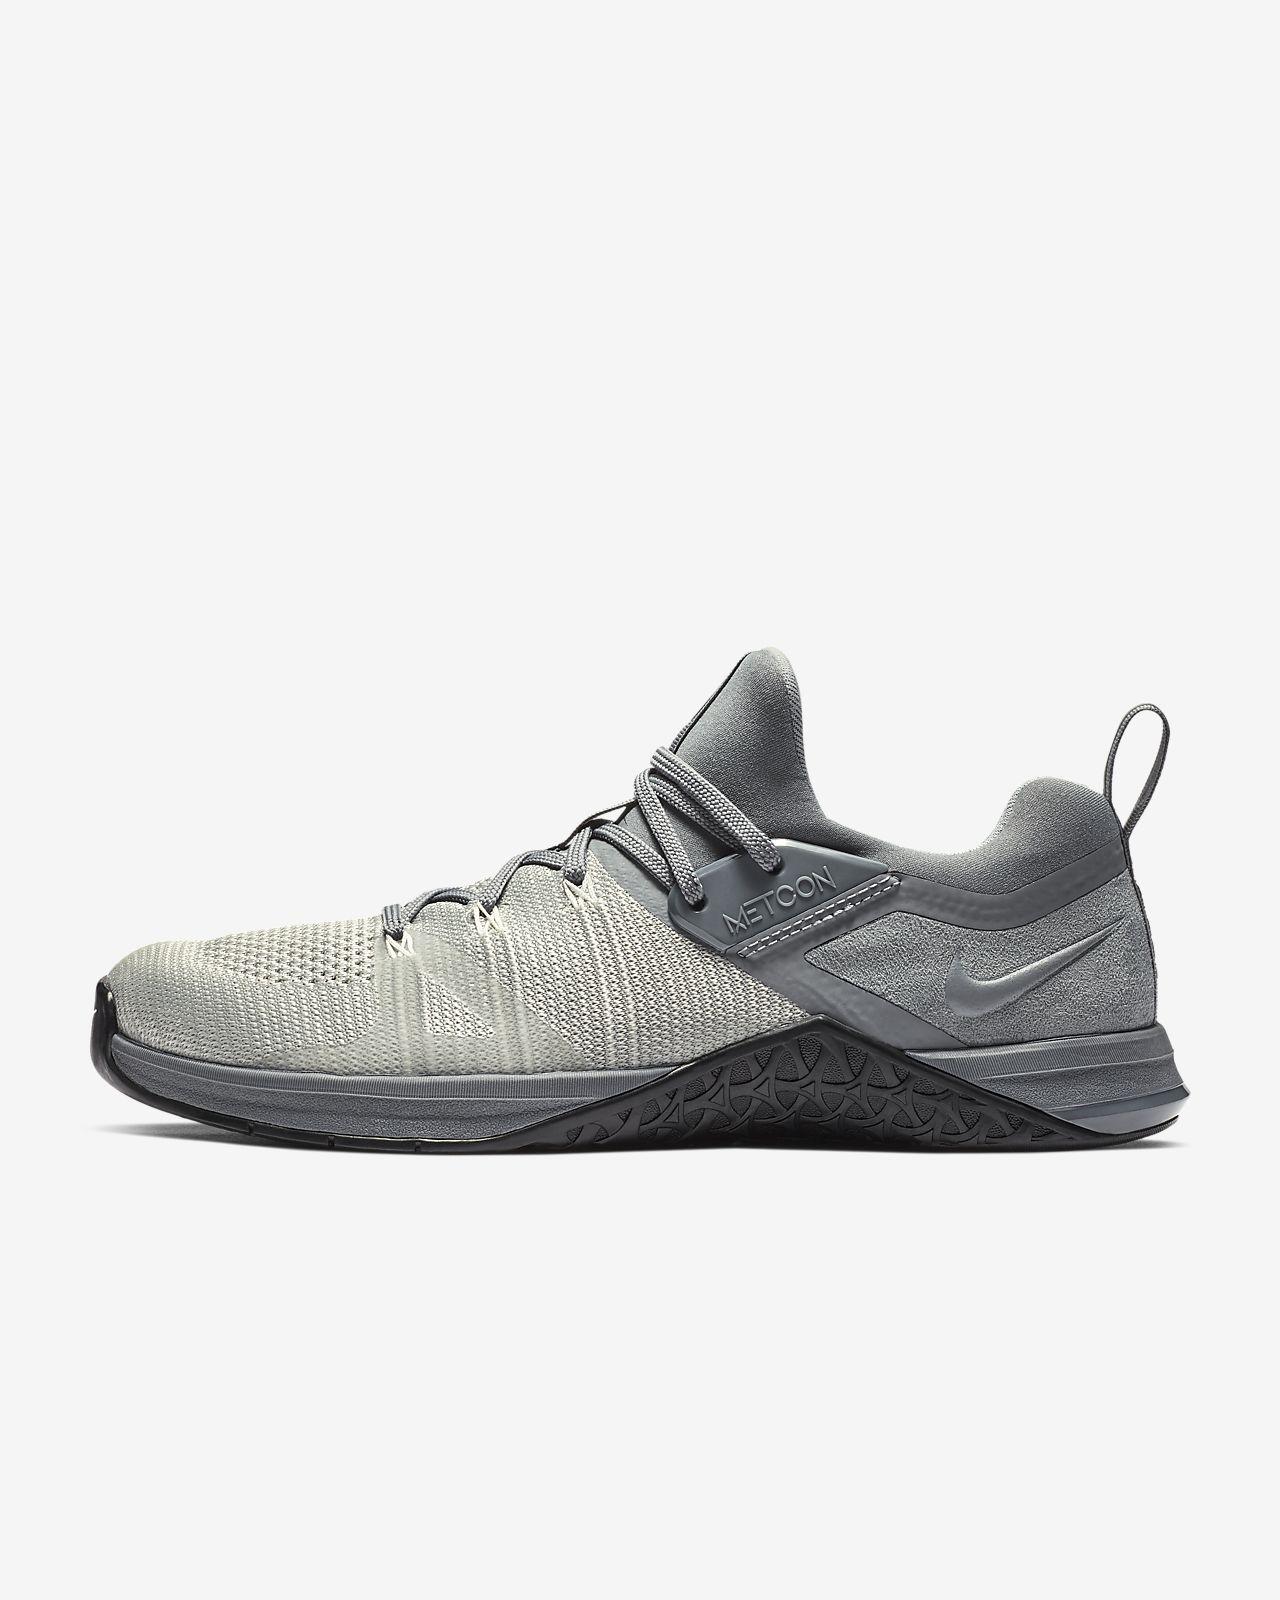 54cdad8a4dbf5 Nike Metcon Flyknit 3 Men s Cross-Training Weightlifting Shoe. Nike ...